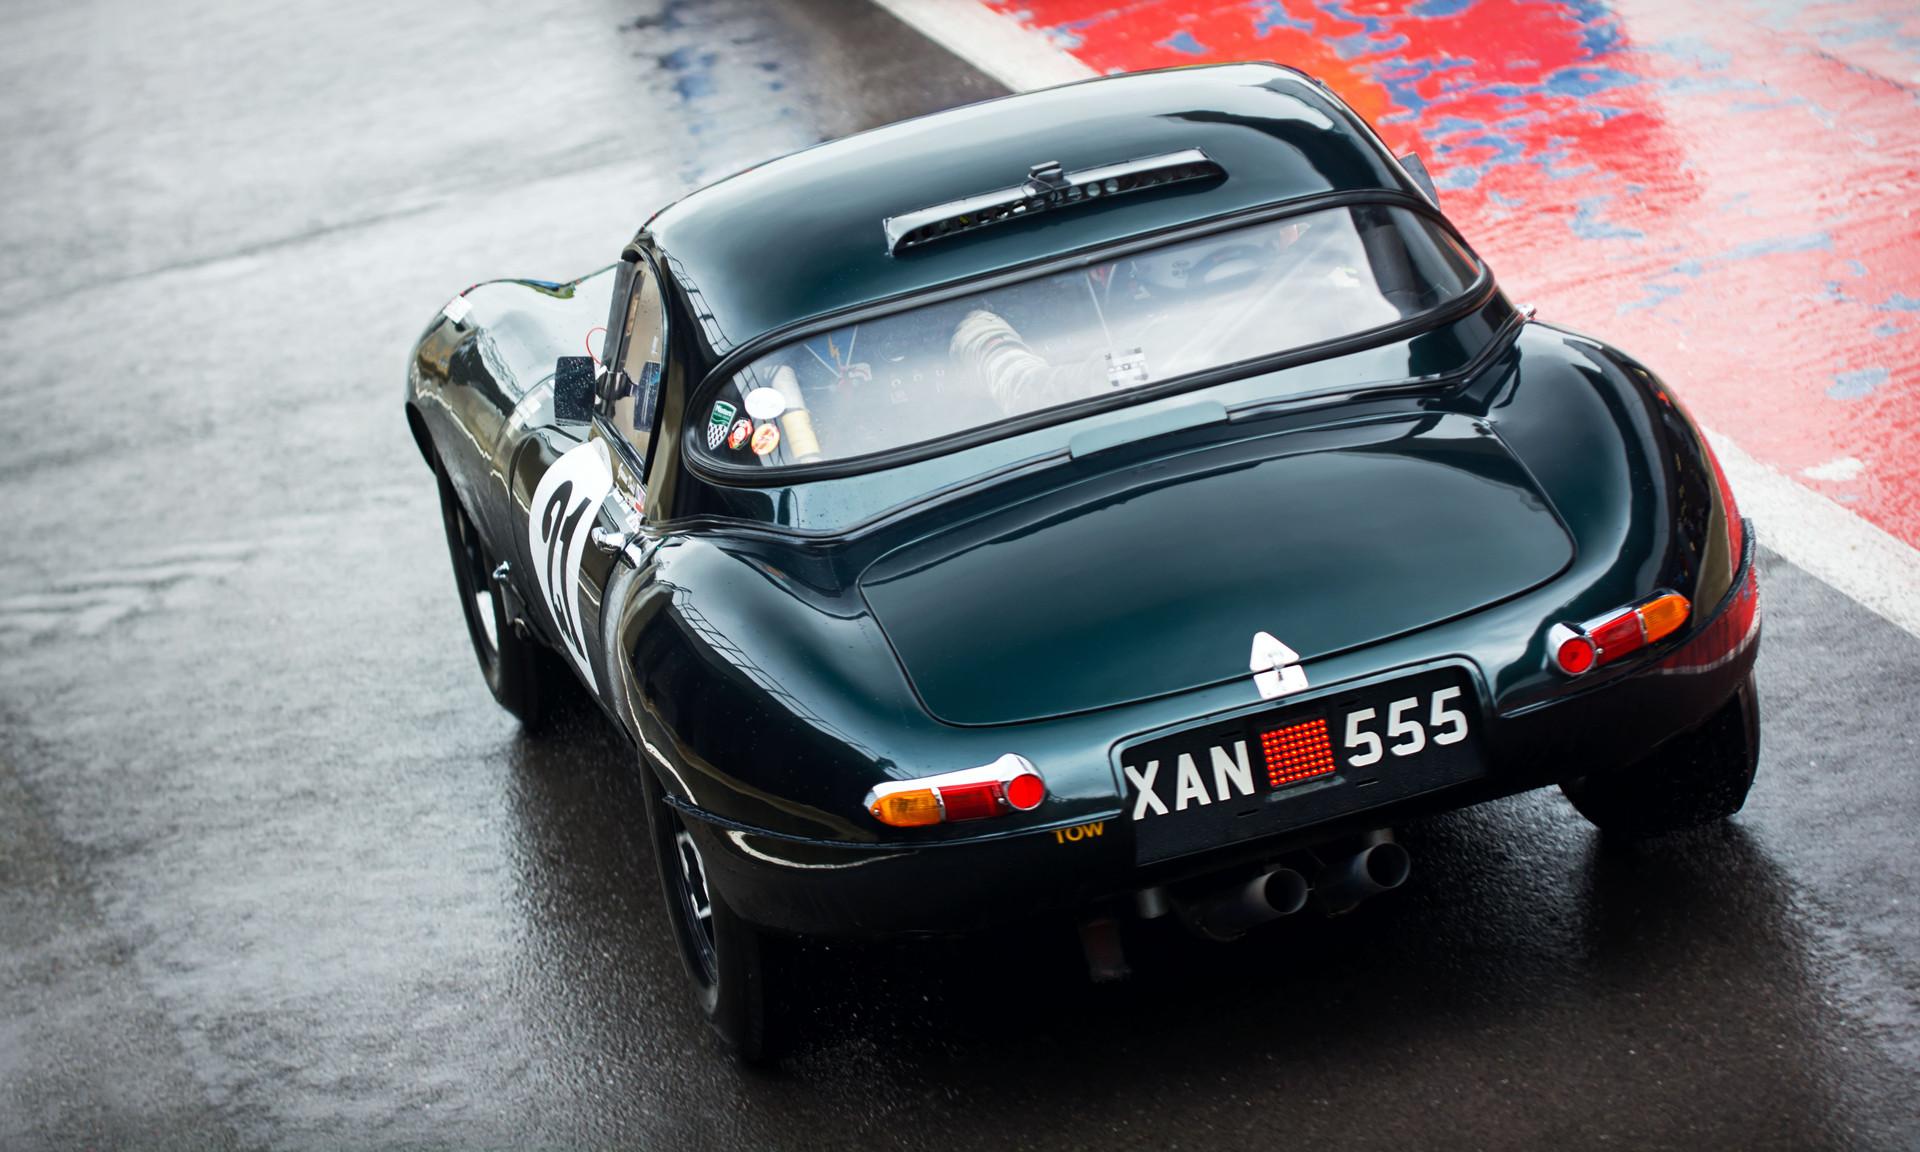 Graeme & James Dodd's 1962 Jaguar E-Type at the 2018 Silverstone Classic Preview Day